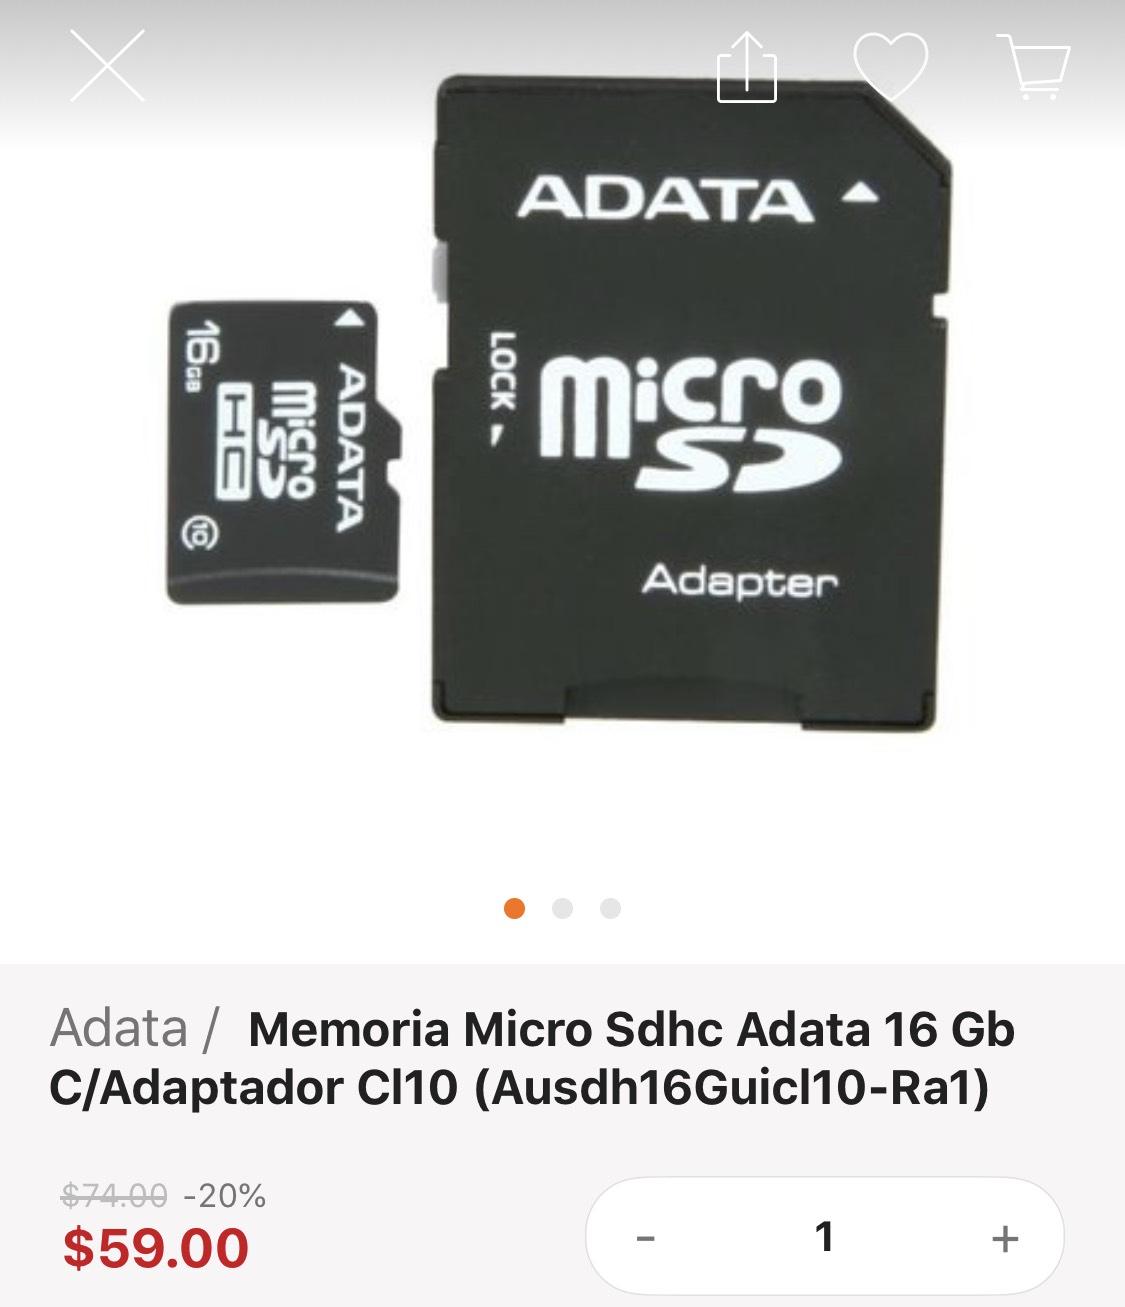 Lino: Micro sdhc de 16gb + $39 de envío